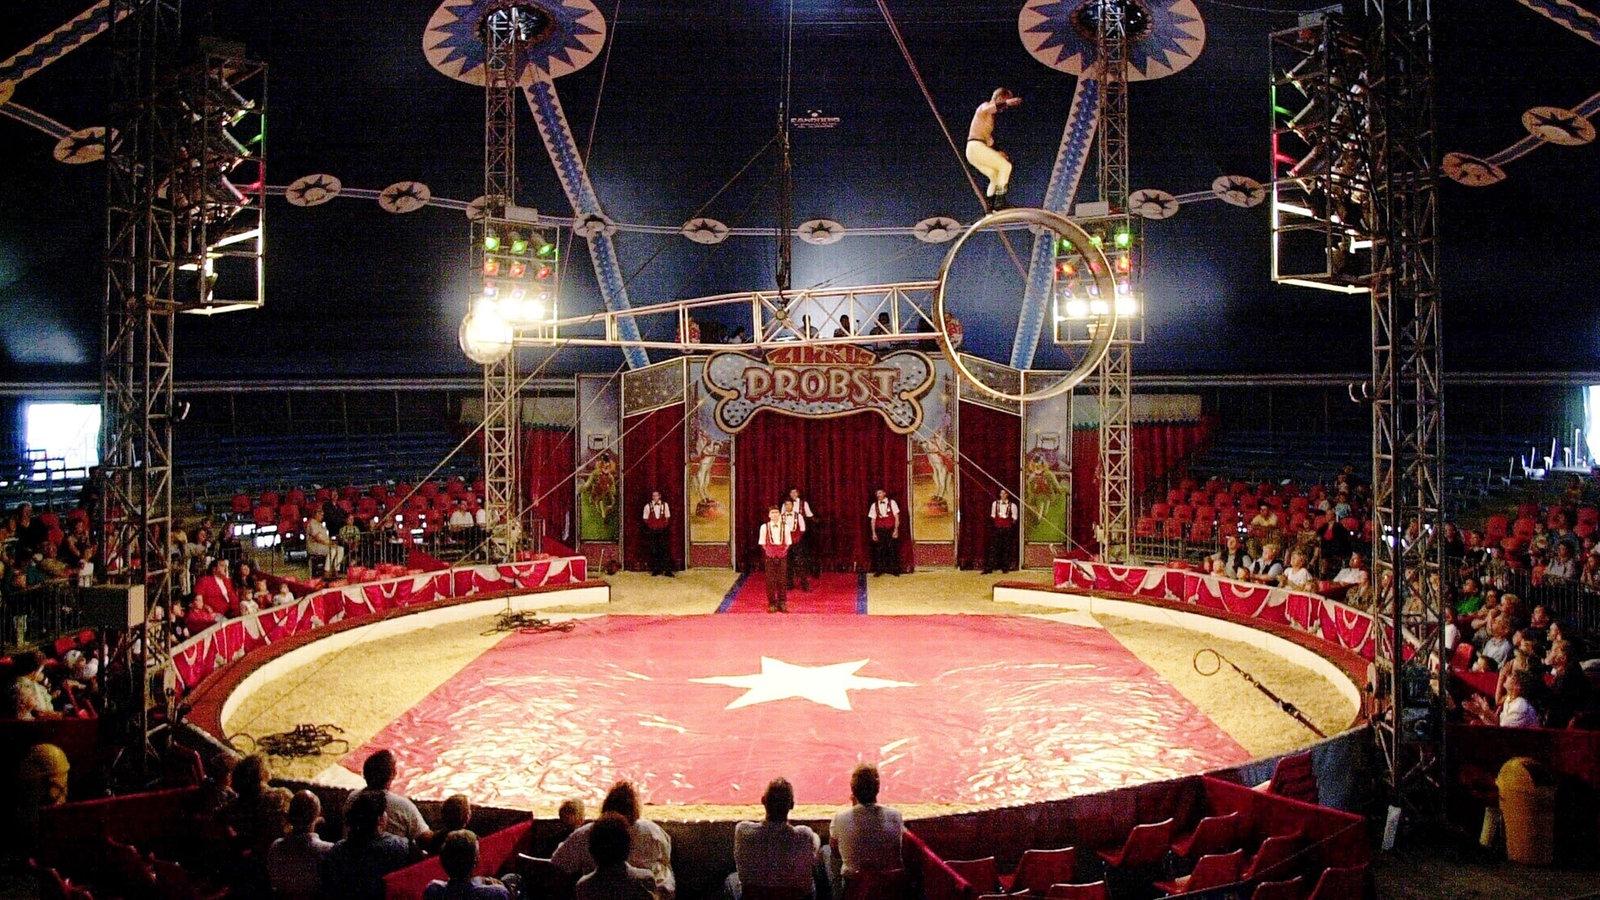 Zirkus Nrw